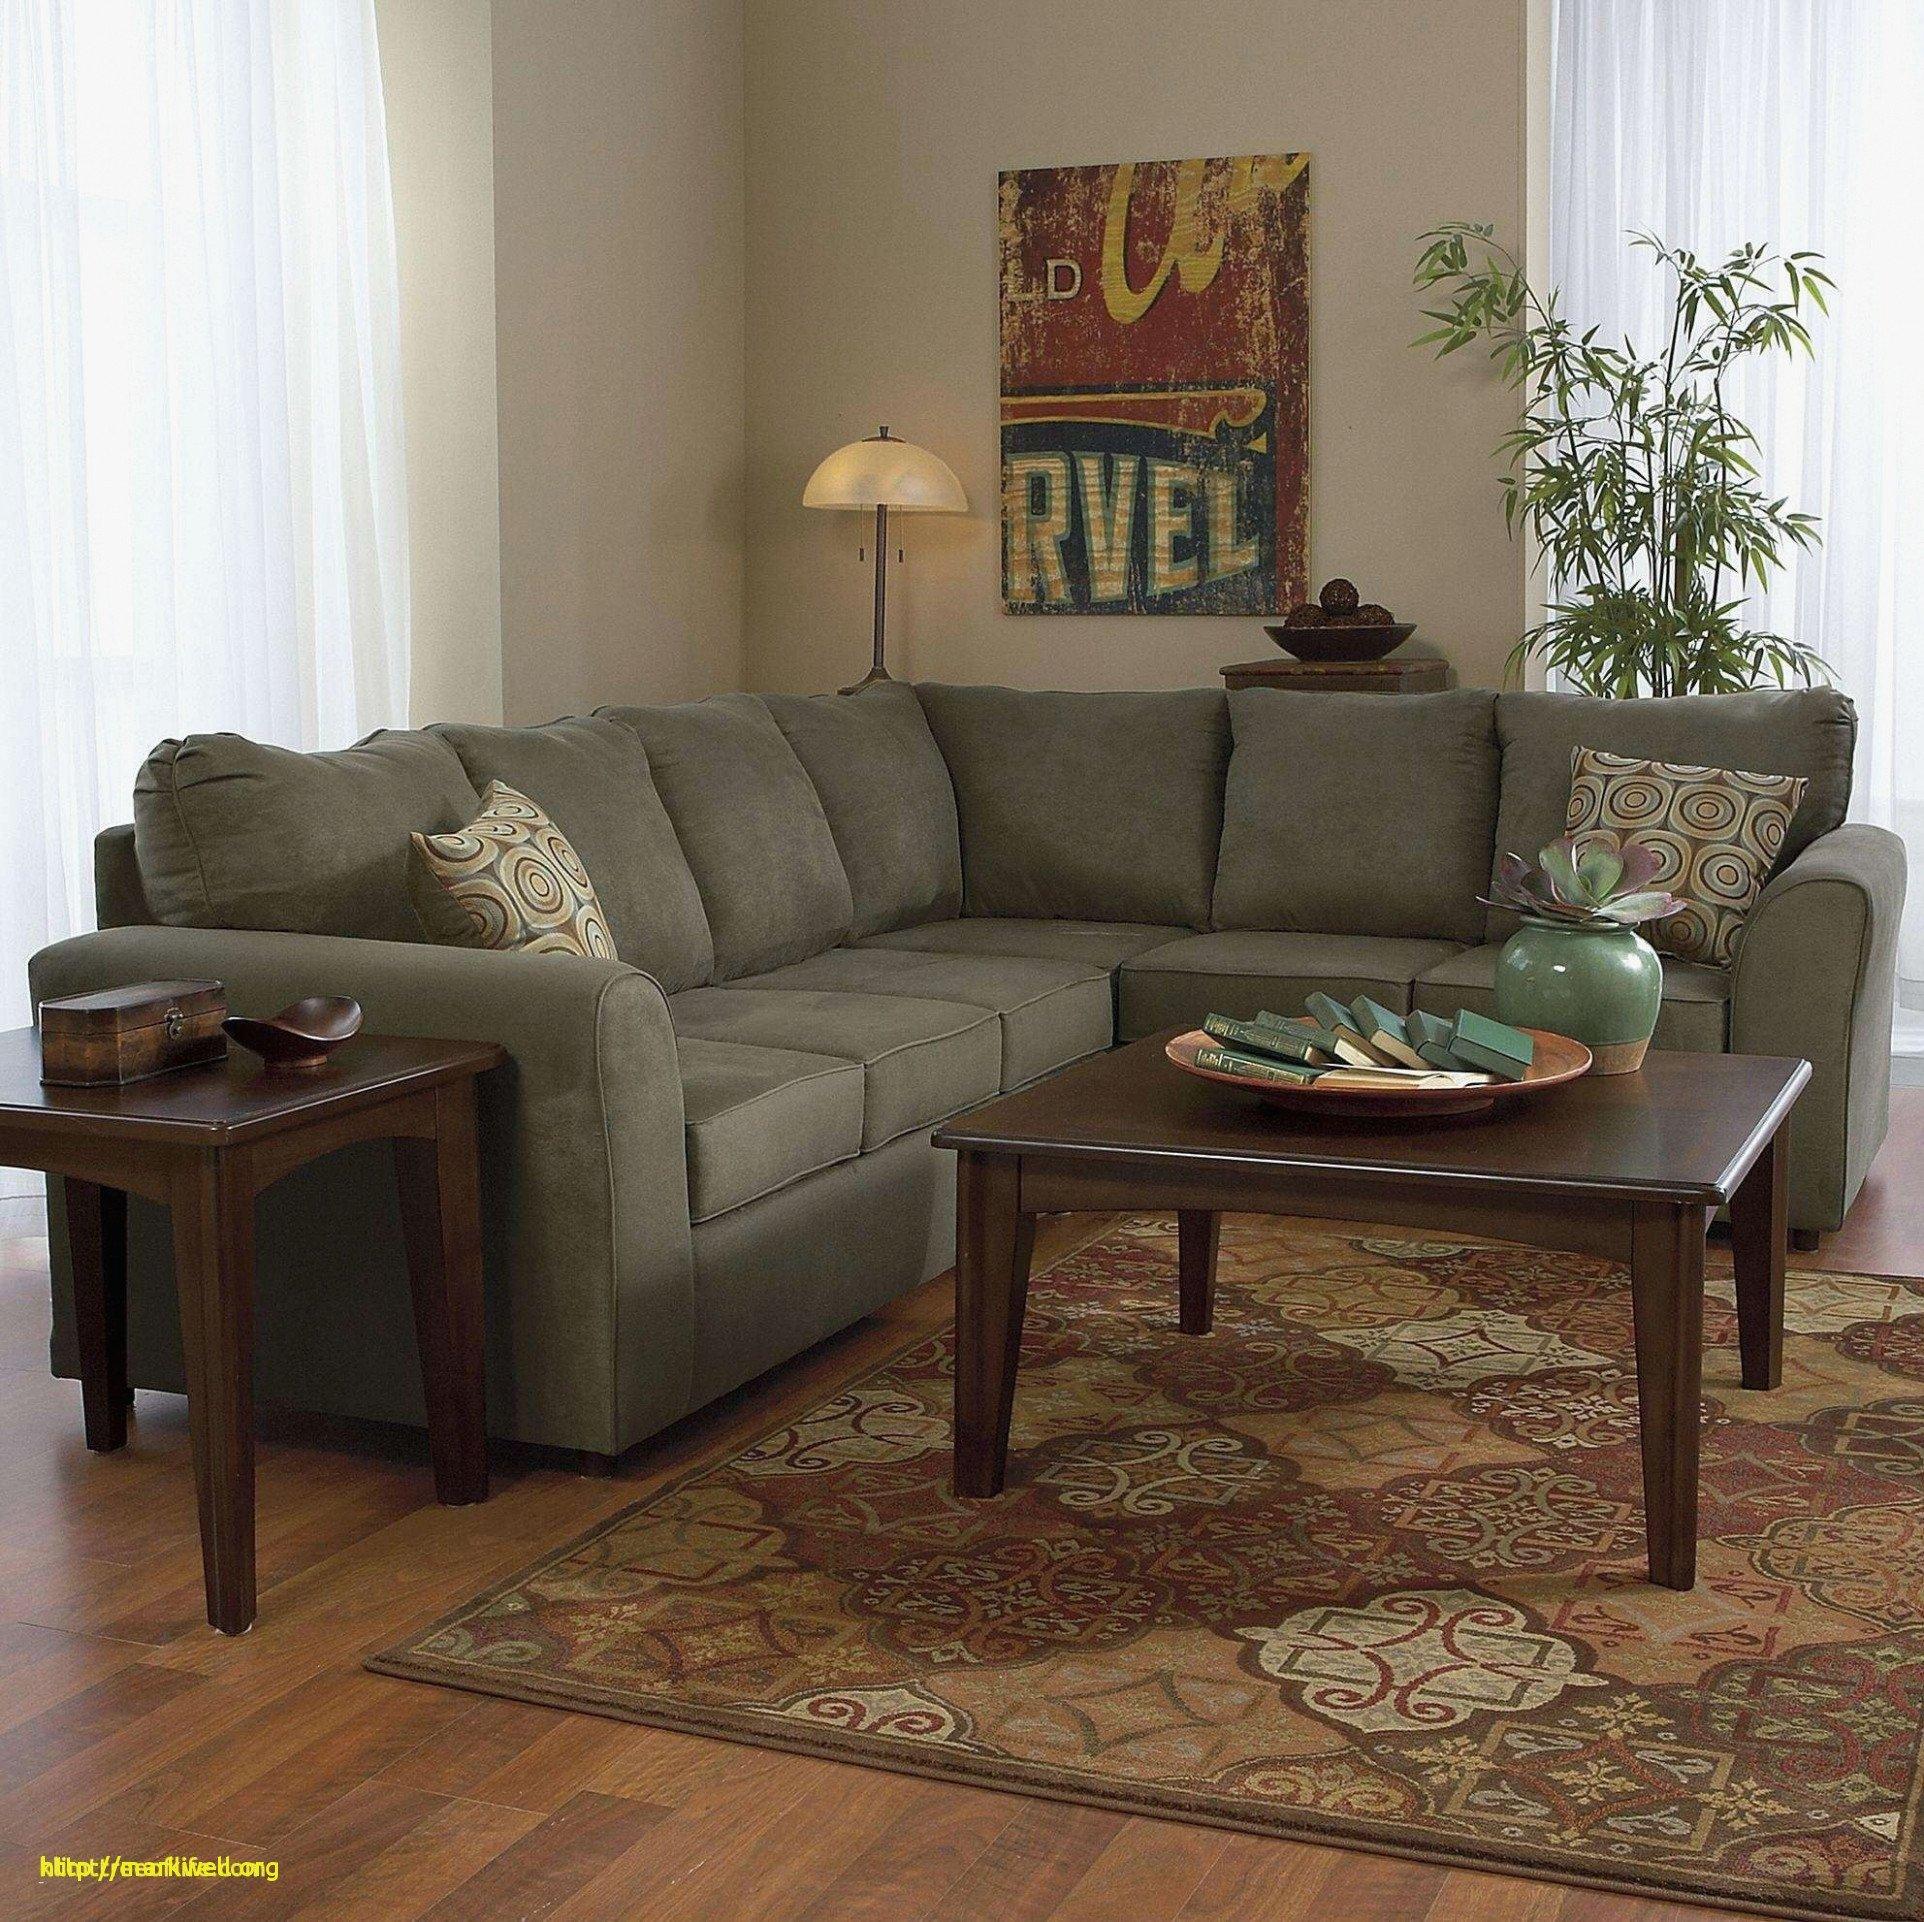 Ashley Home Store Bedroom Set Elegant Unique Living Room Accent Furniture